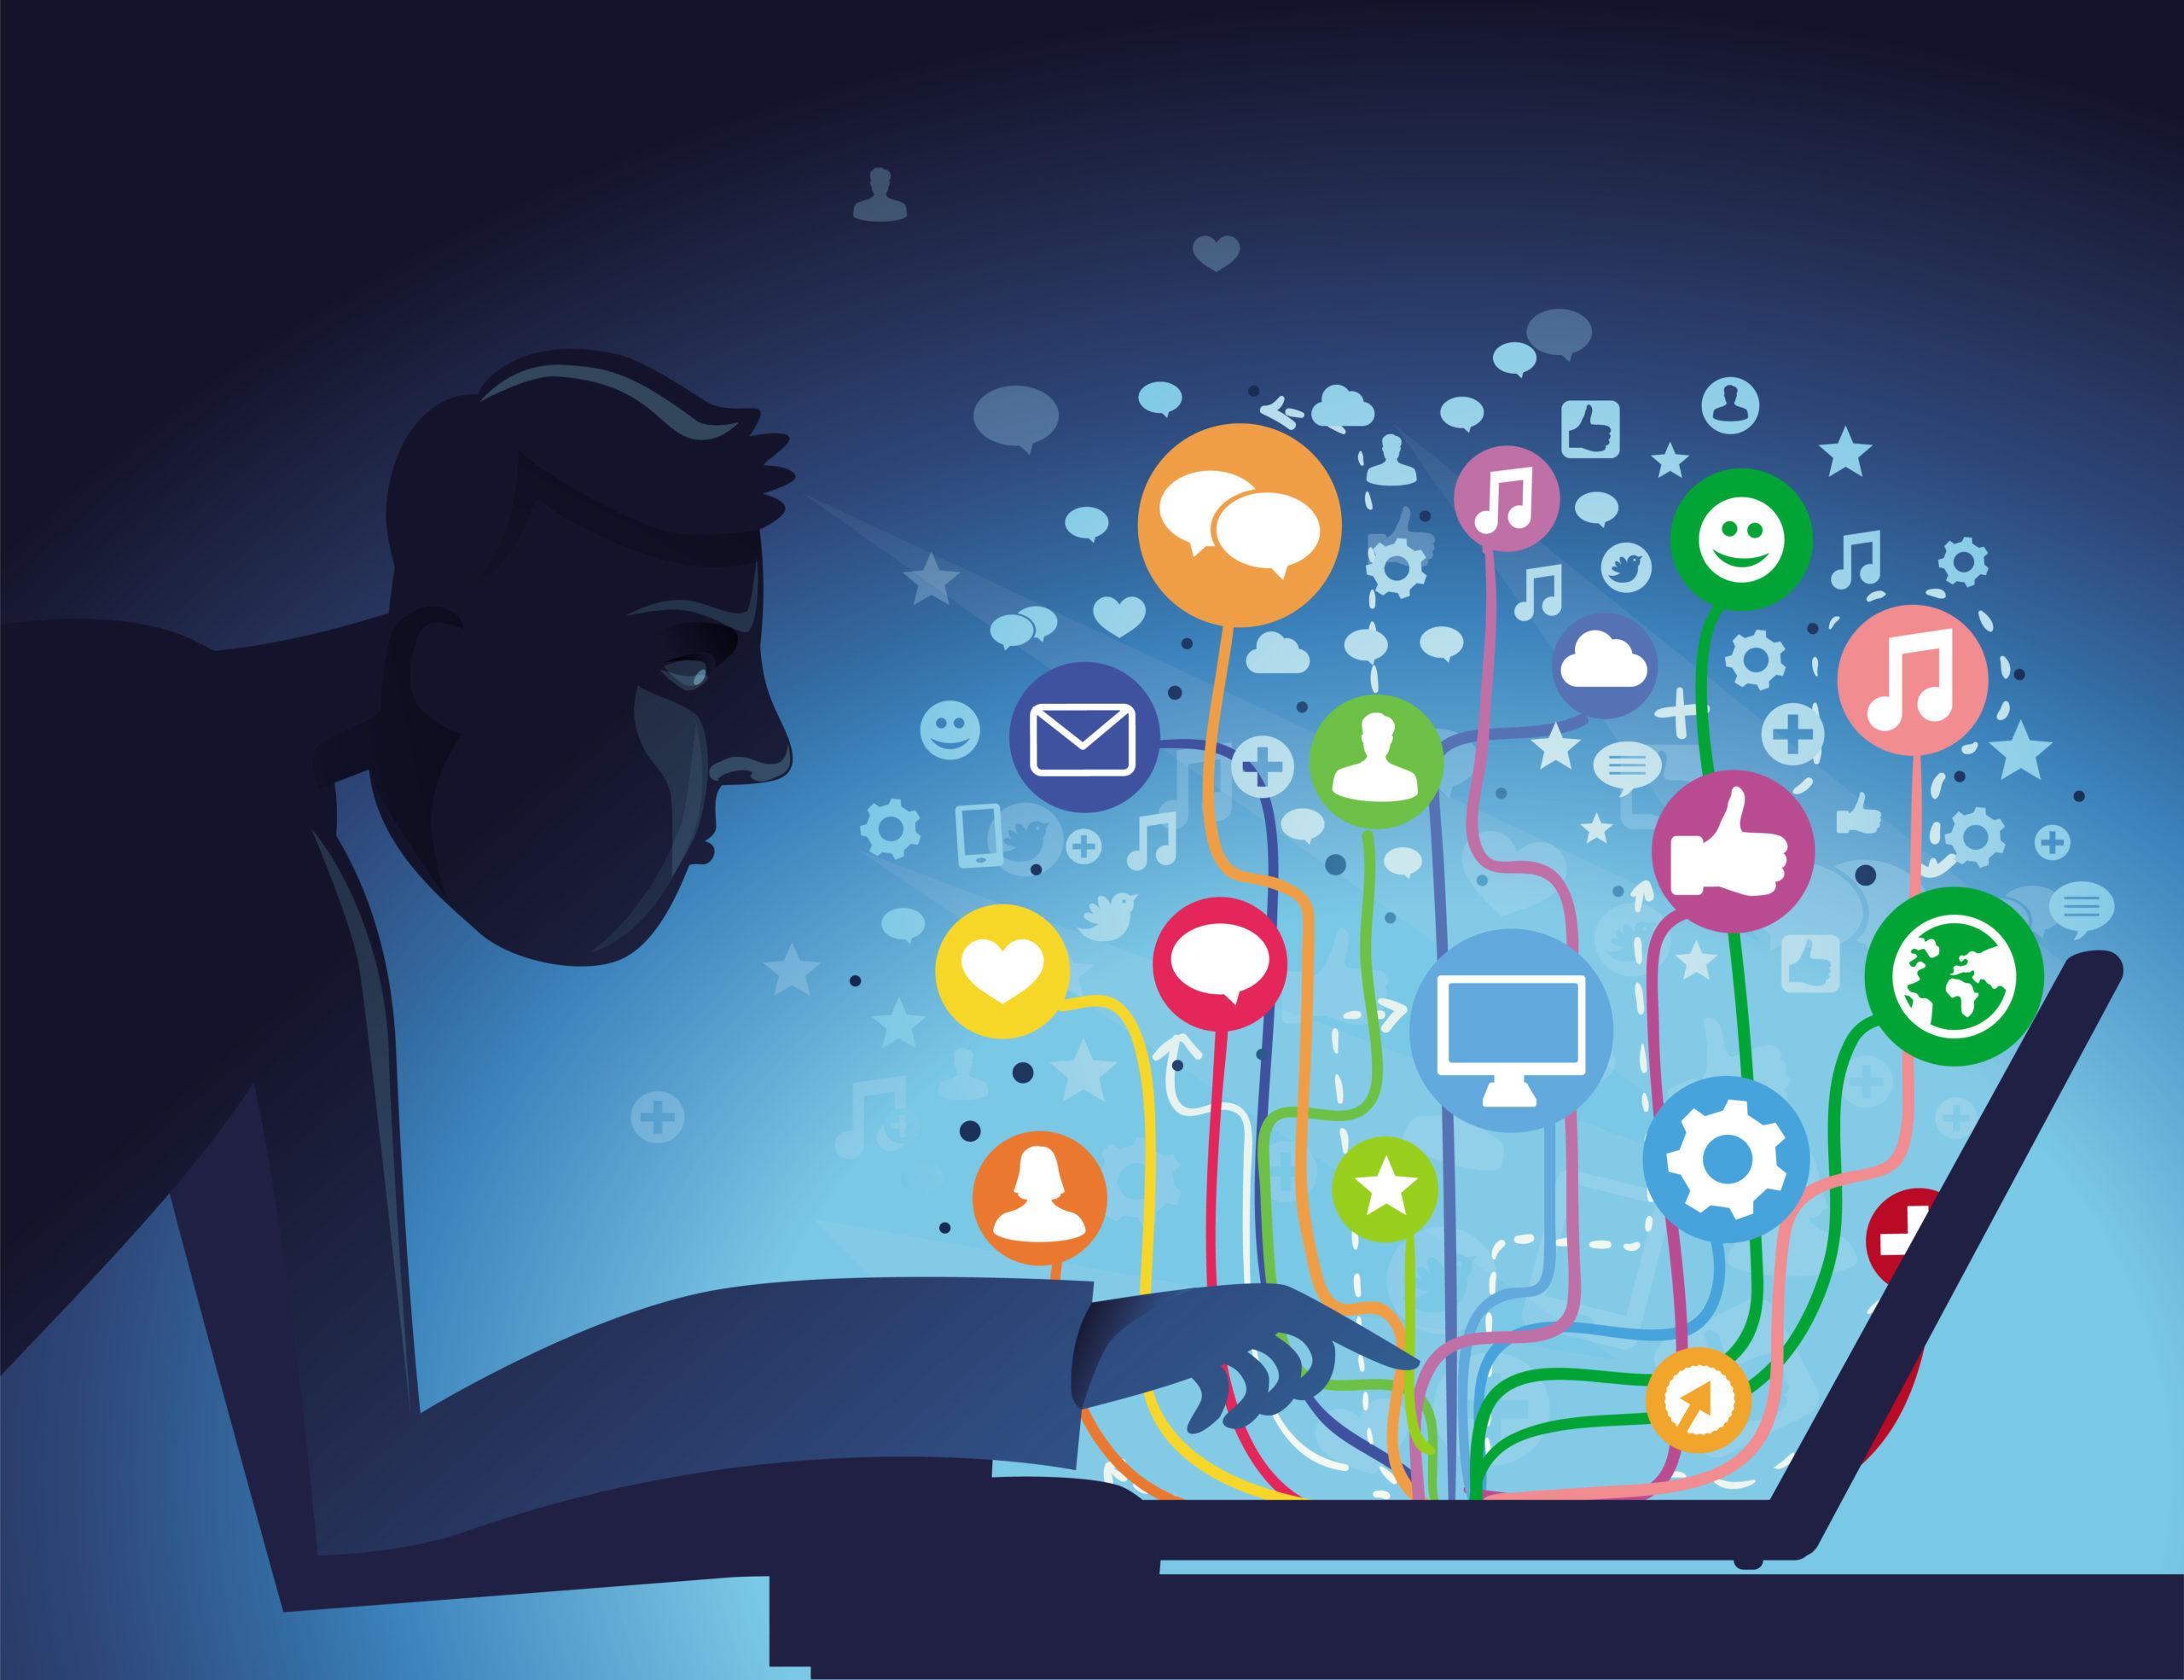 10 Tools Under $100 to Streamline Your Social Media Marketing